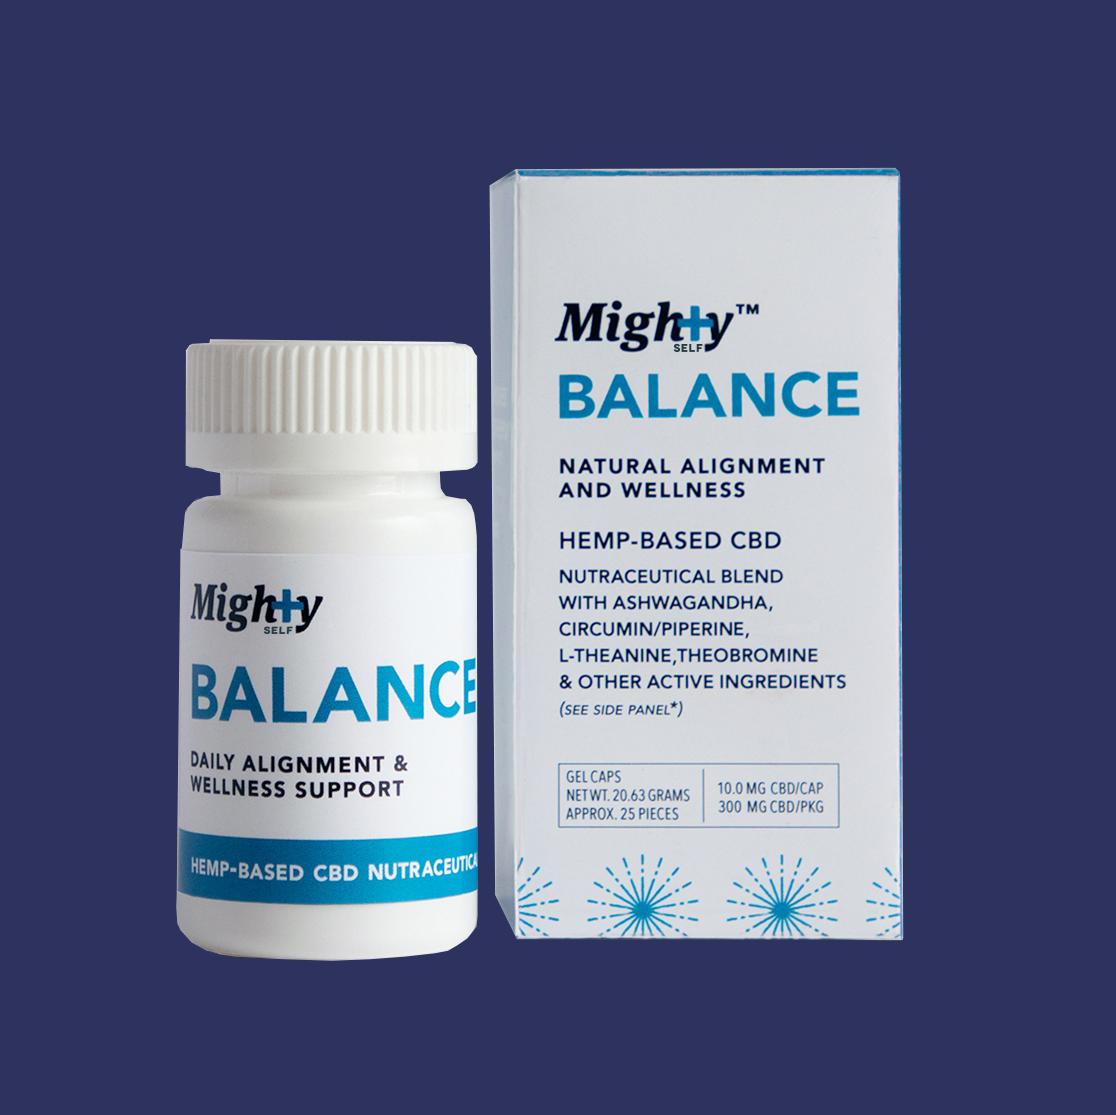 Mighty-Balance-Adaptogenic-CBD.png